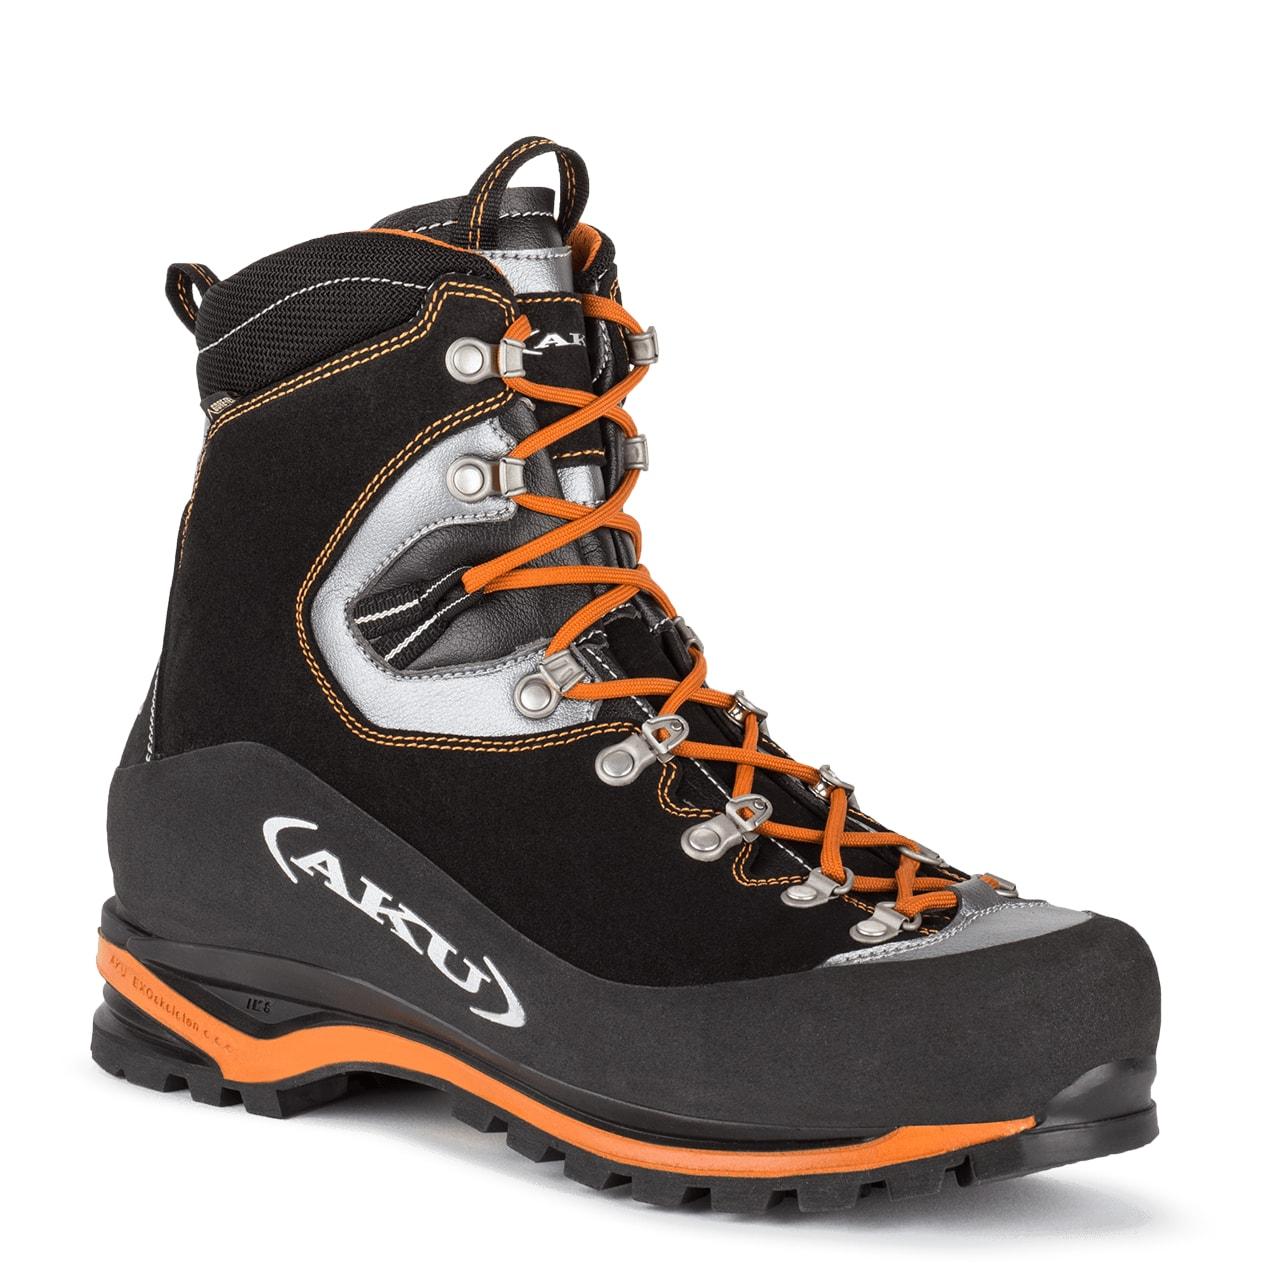 Ботинки мужские AKU Yatumine GTX, black/orange,